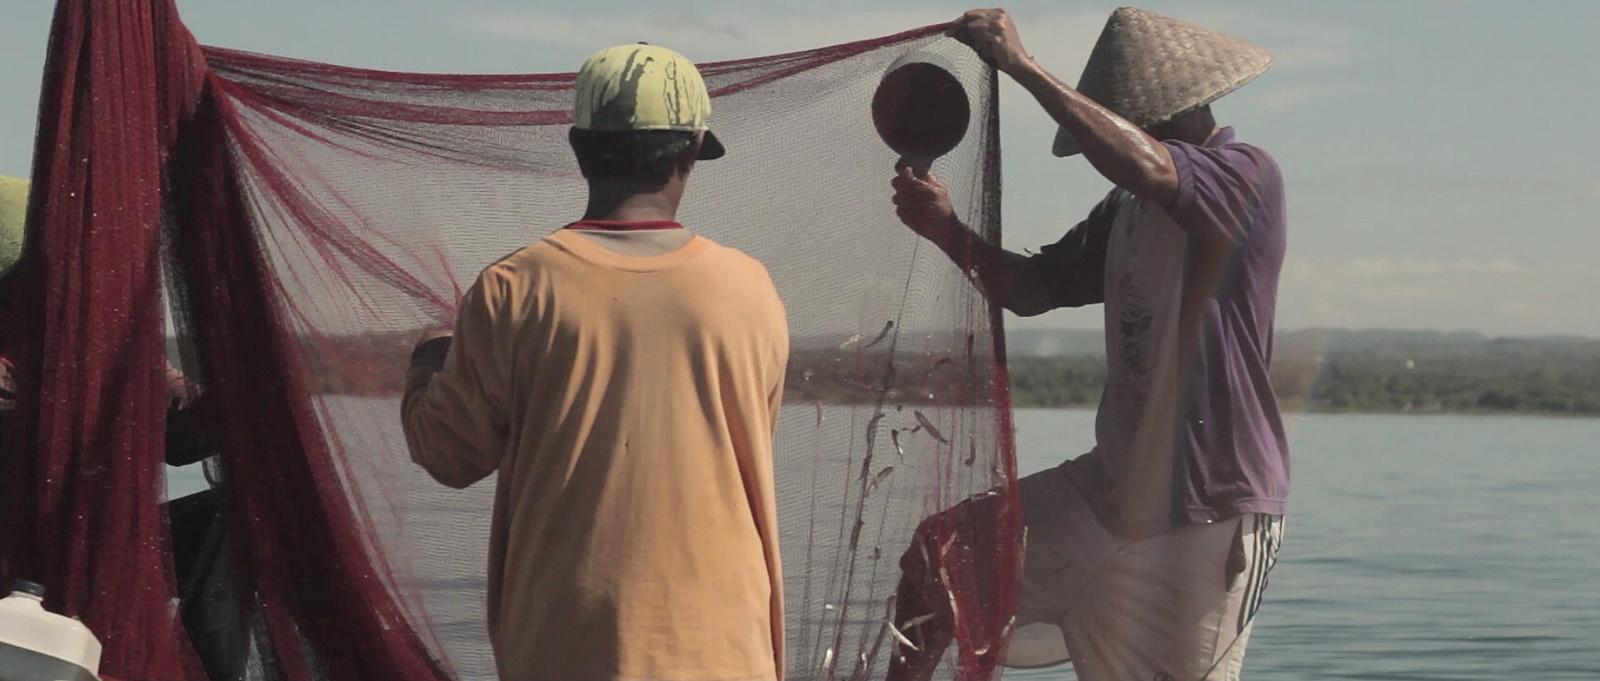 06-help-these-fishermen_resize.jpg